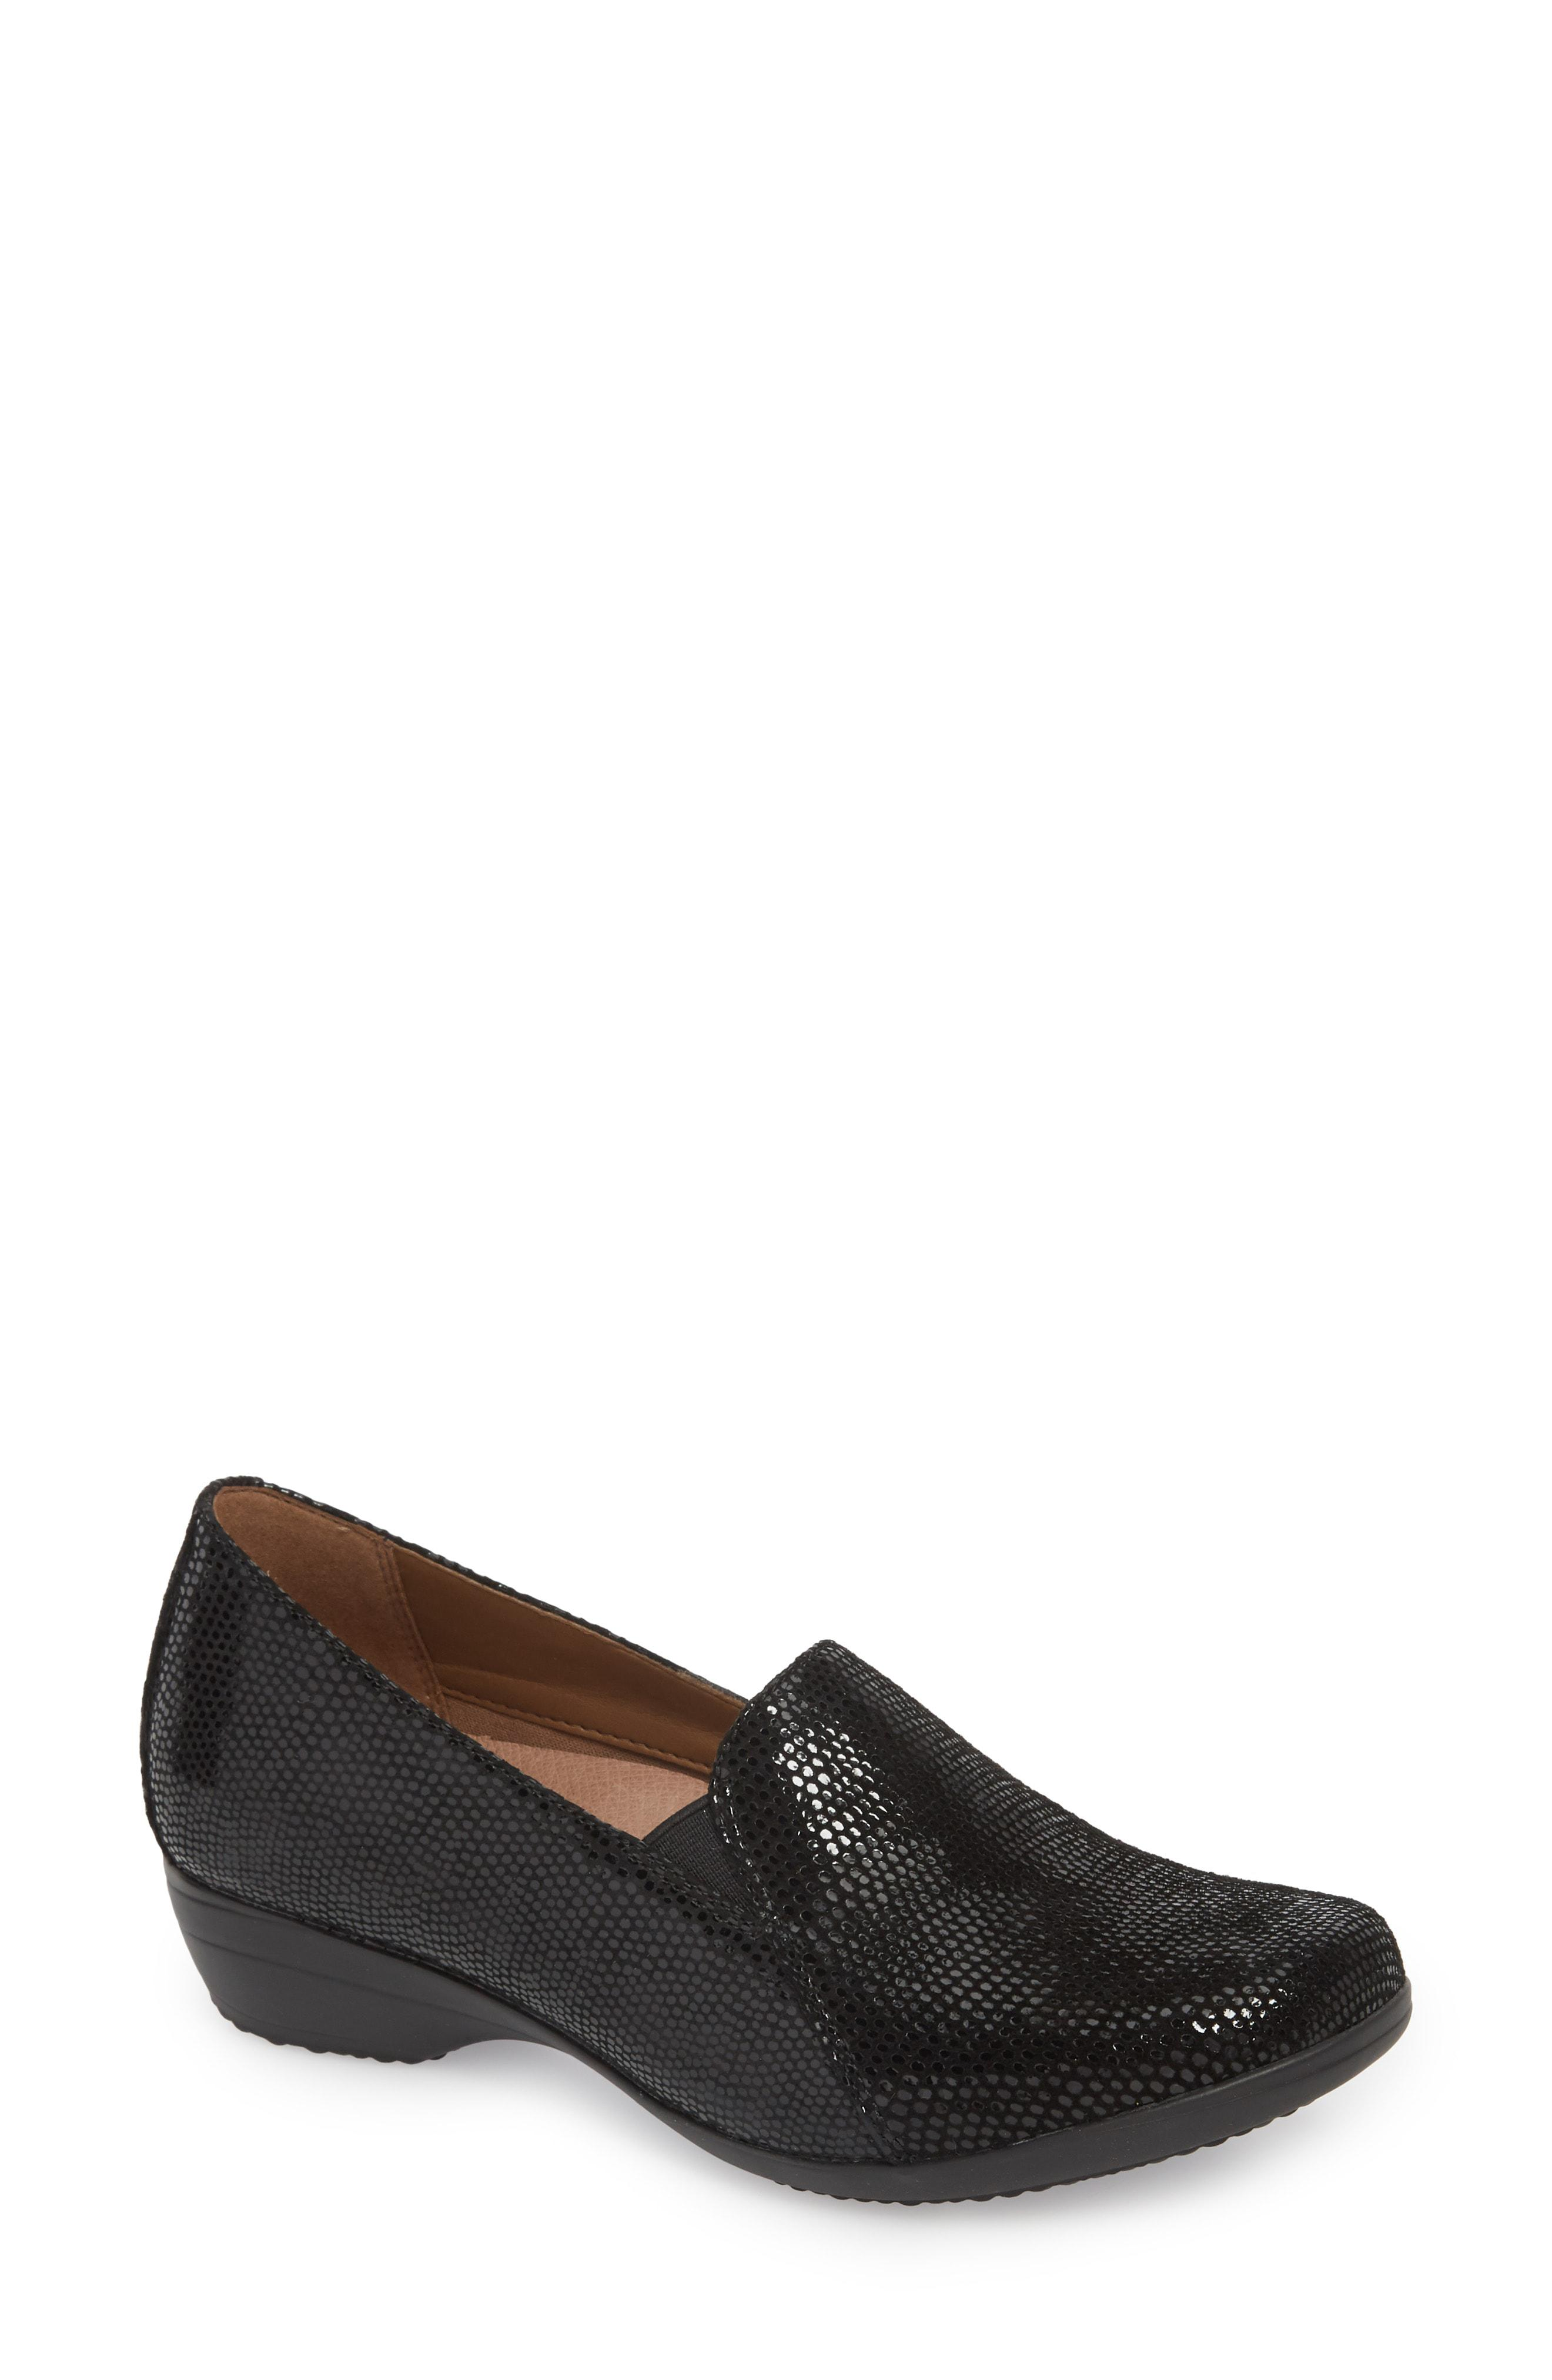 fe6dc643295 Lyst - Dansko Farah Loafer in Black - Save 40%